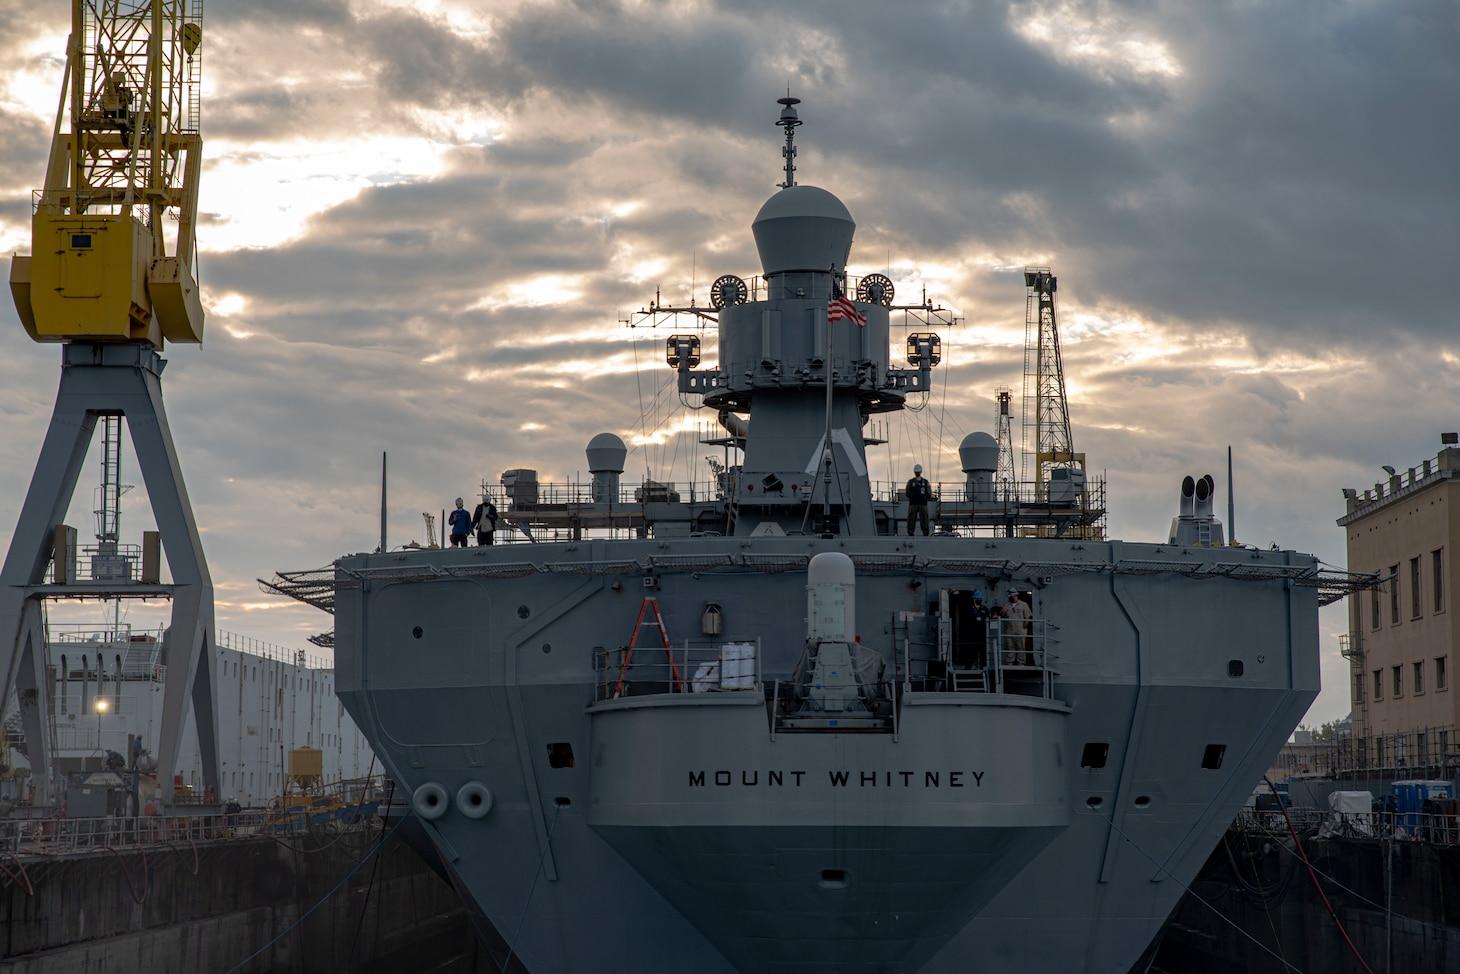 the ship's dry dock phase in San Giorgio Del Porto in Genoa, Italy